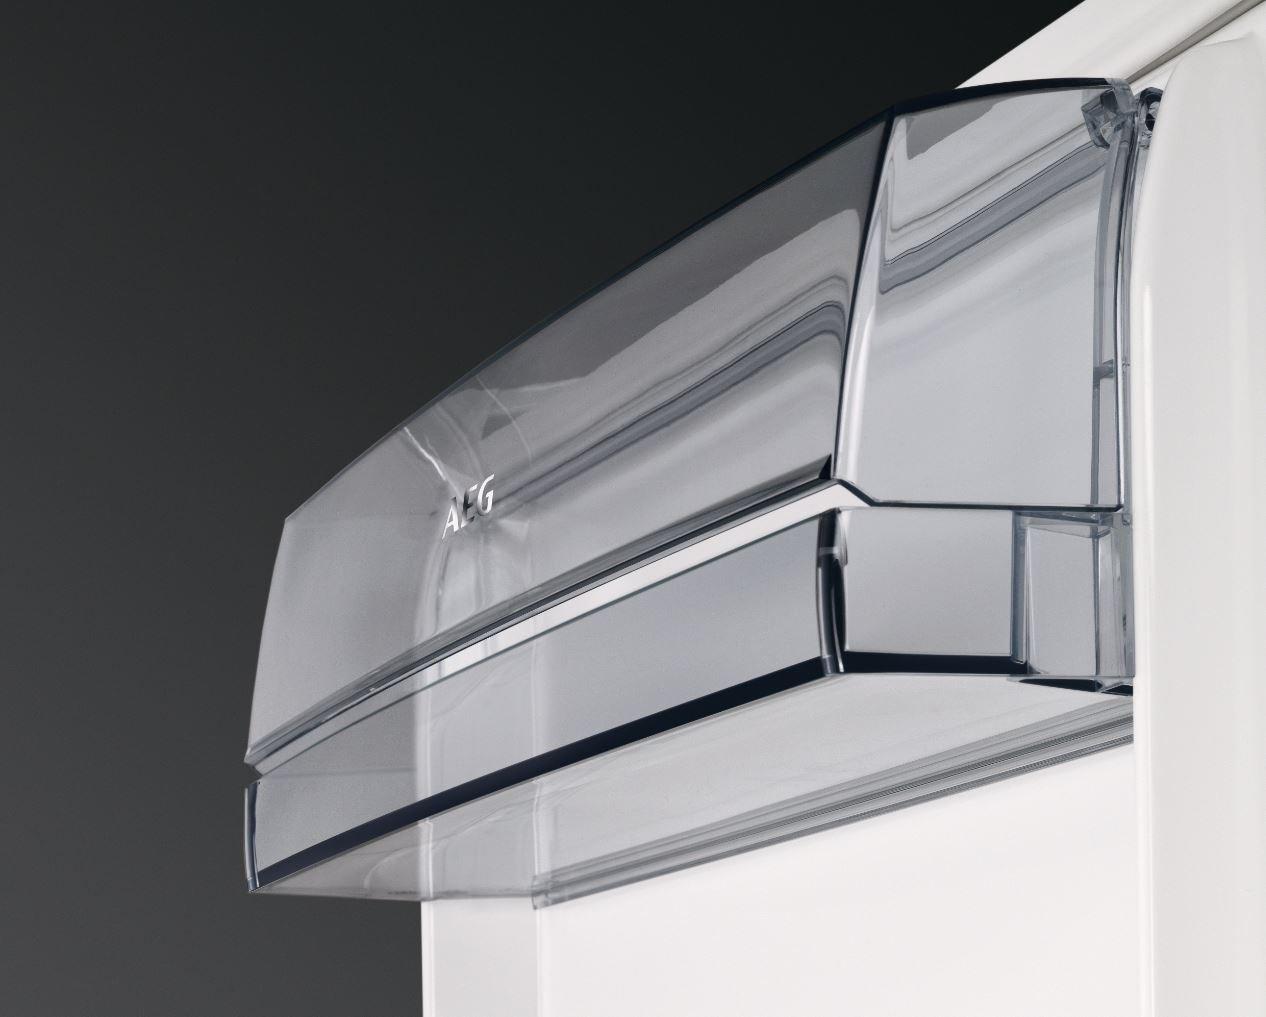 Aeg Kühlschrank Wird Nicht Kalt : Aeg sfb as kühlschrank vollintegrierbar weiß a